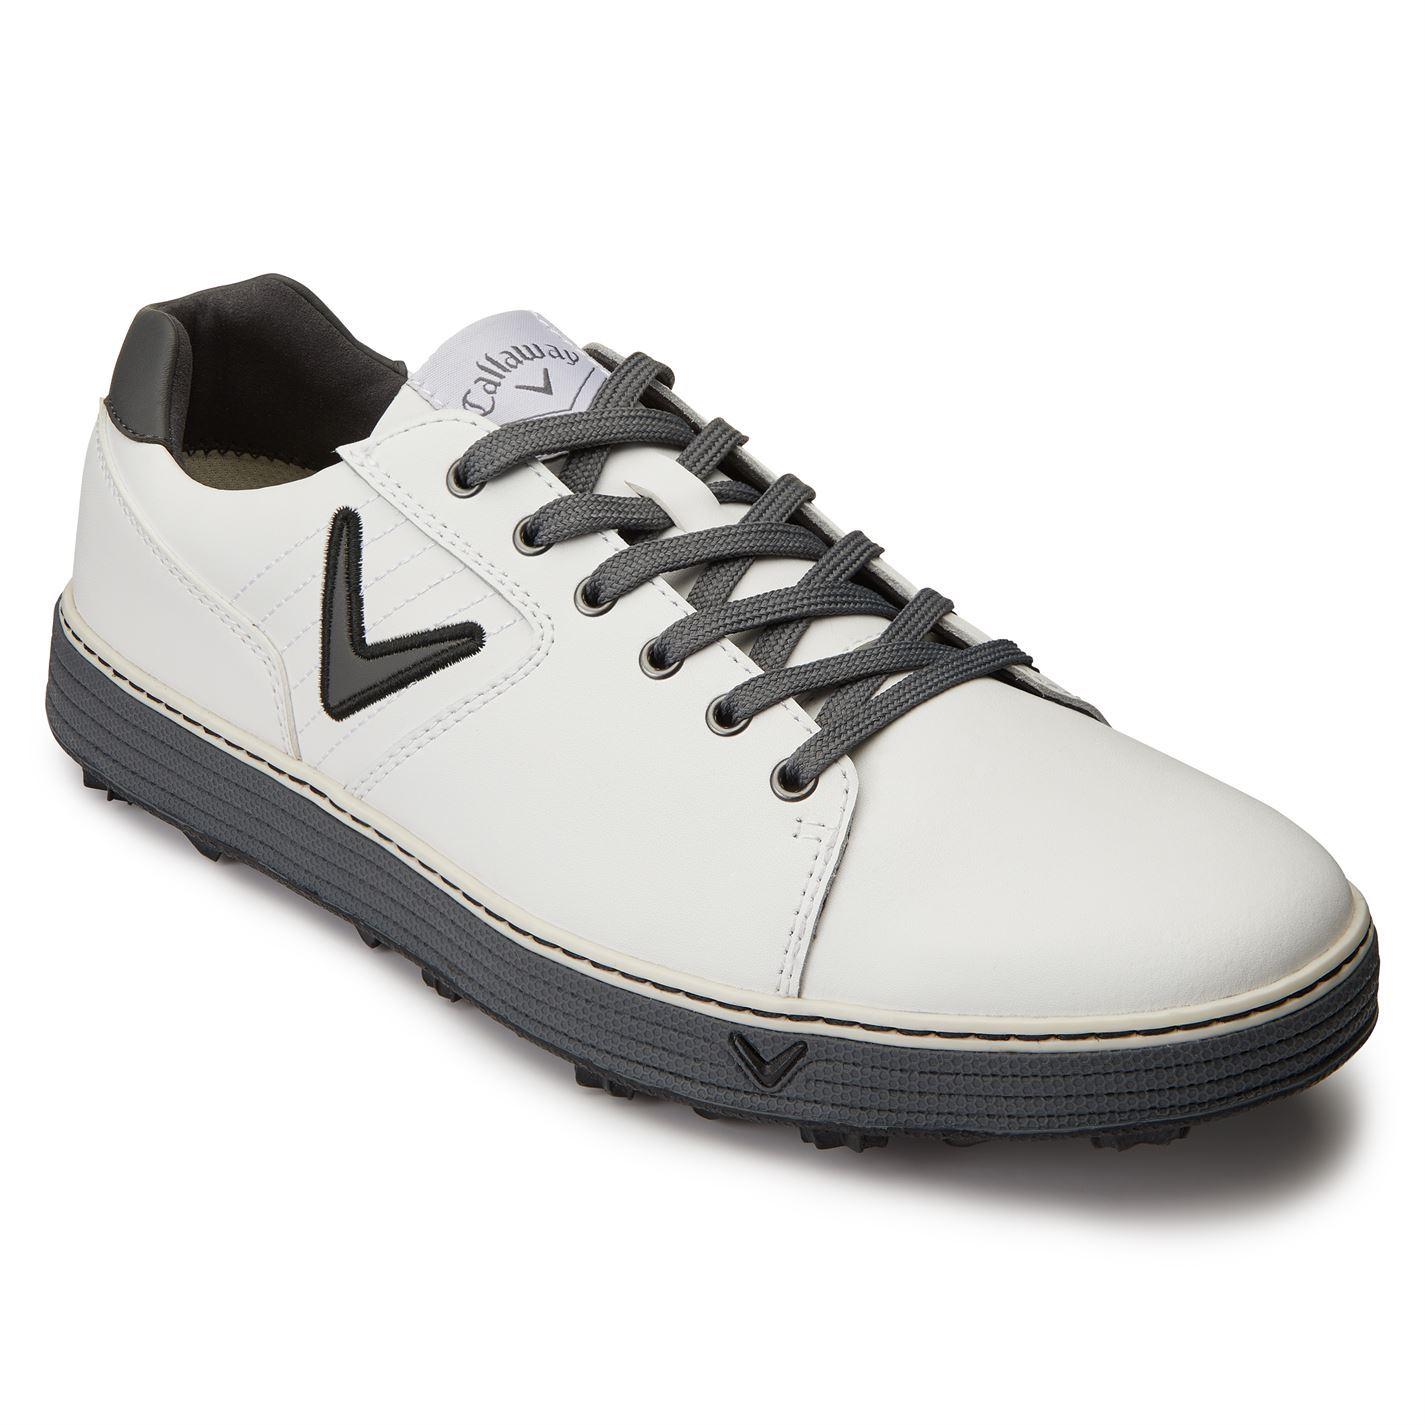 Callaway-Delmar-Urban-Golf-Shoes-Mens-Spikeless-Footwear thumbnail 15